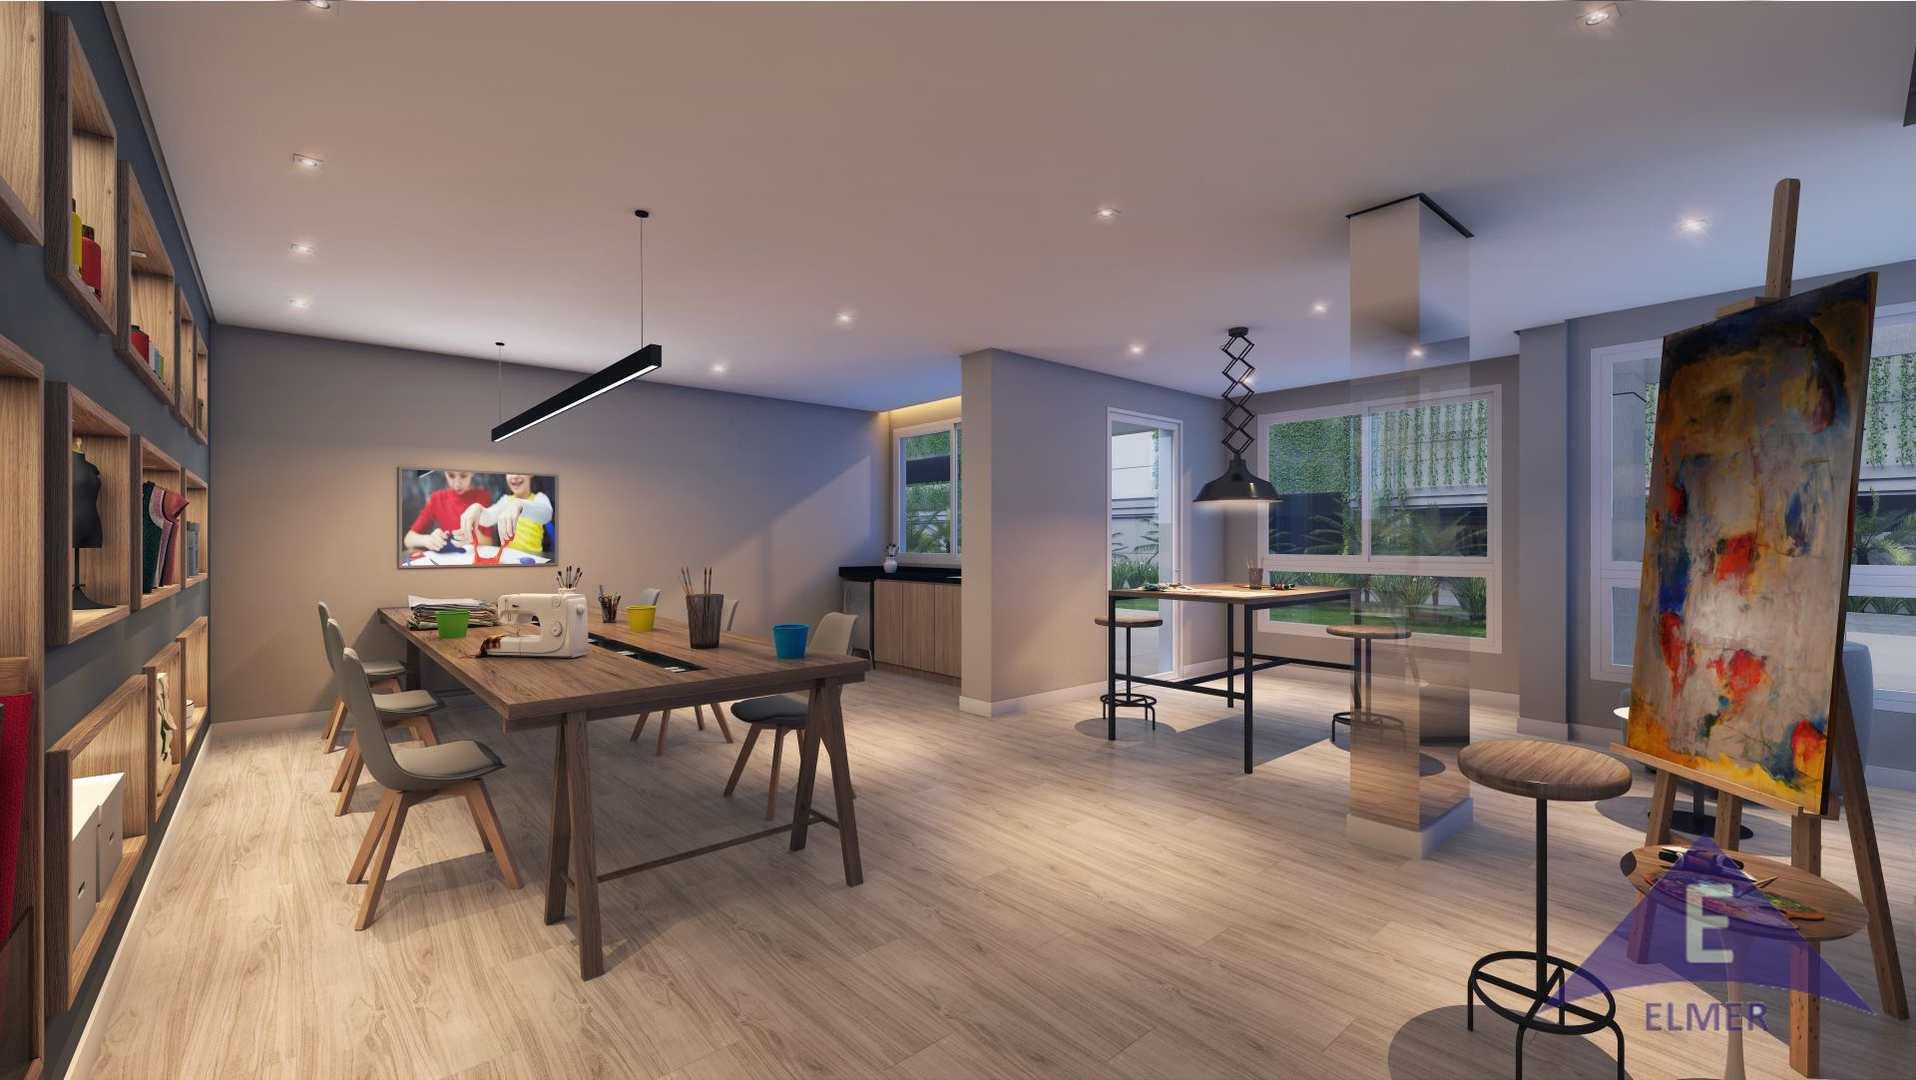 RAIZ SP - Aptos 108 m² - 3 dorm - Lazer completo, Cod 324